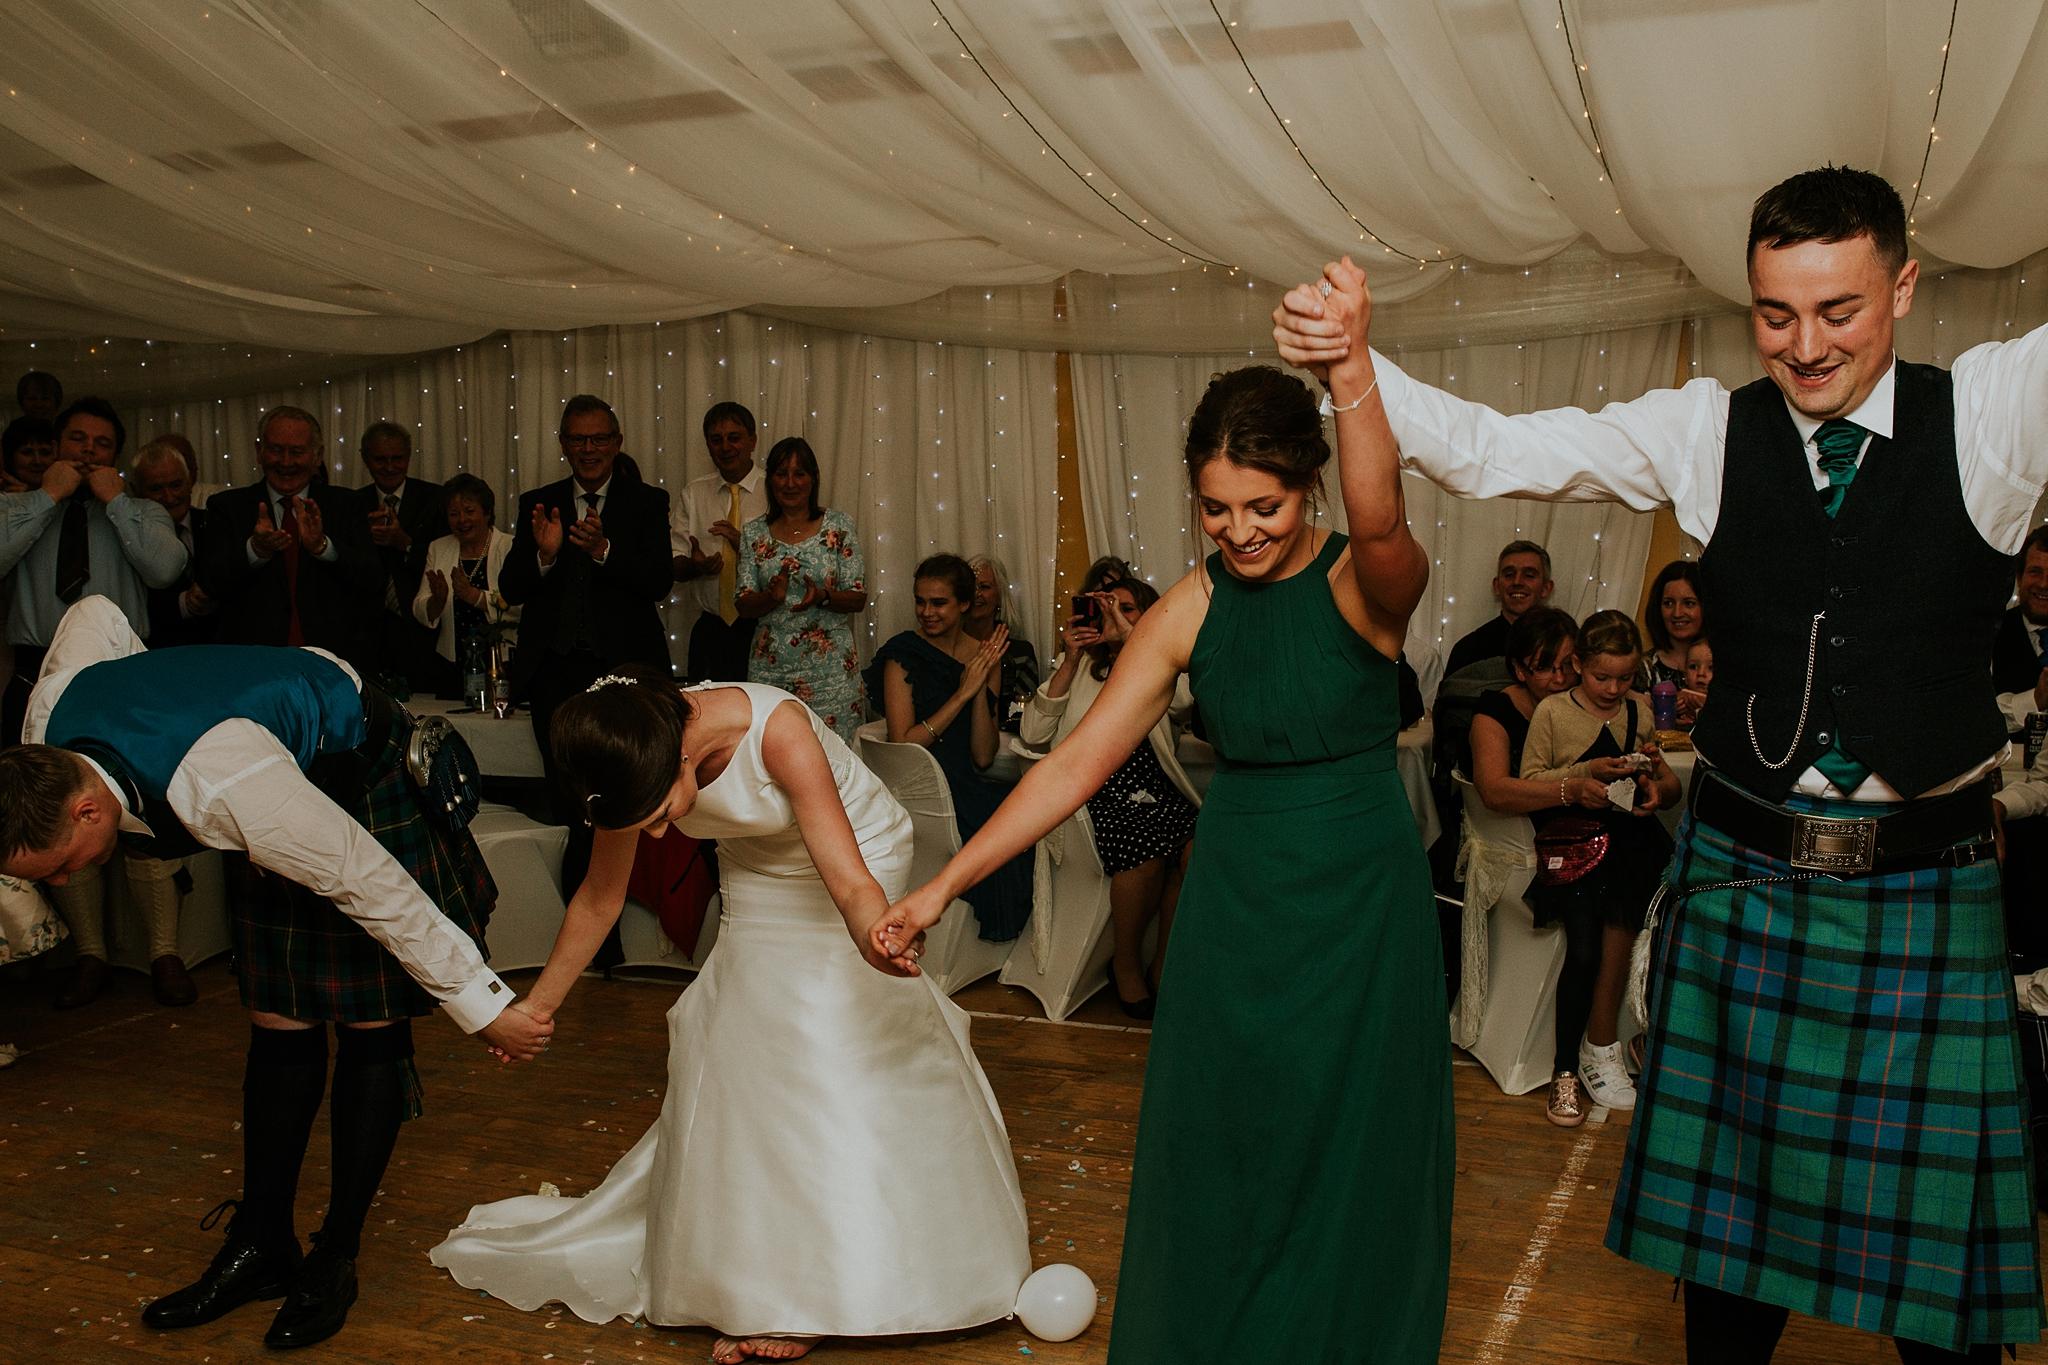 Linda&Shockie_northuist_wedding_photographer-59.JPG